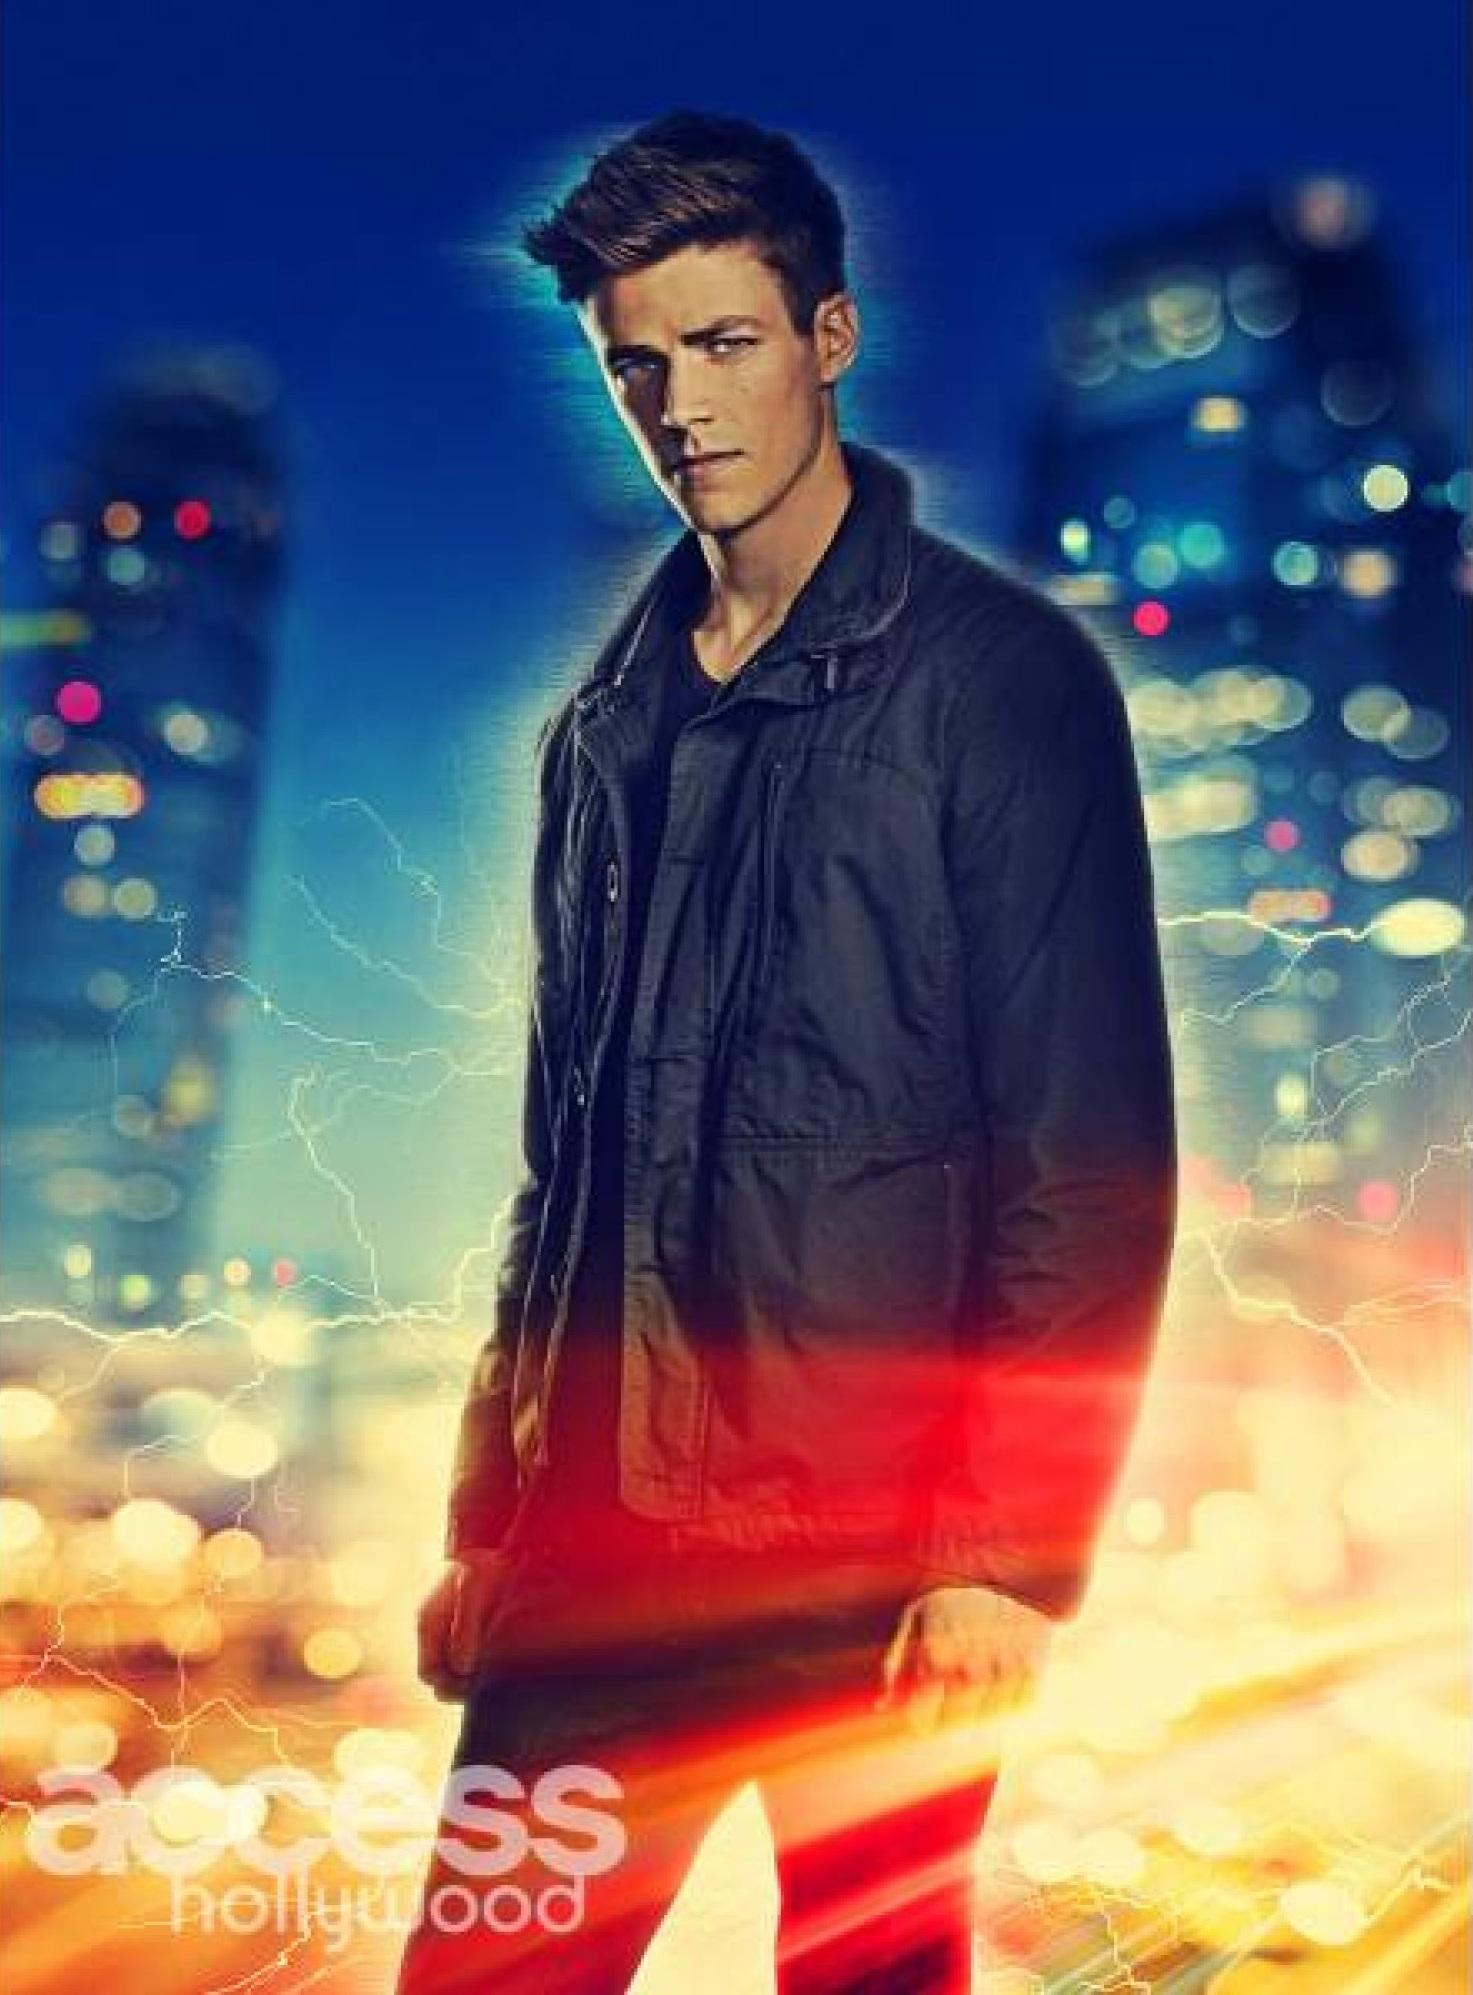 Saison 1 (The Flash)